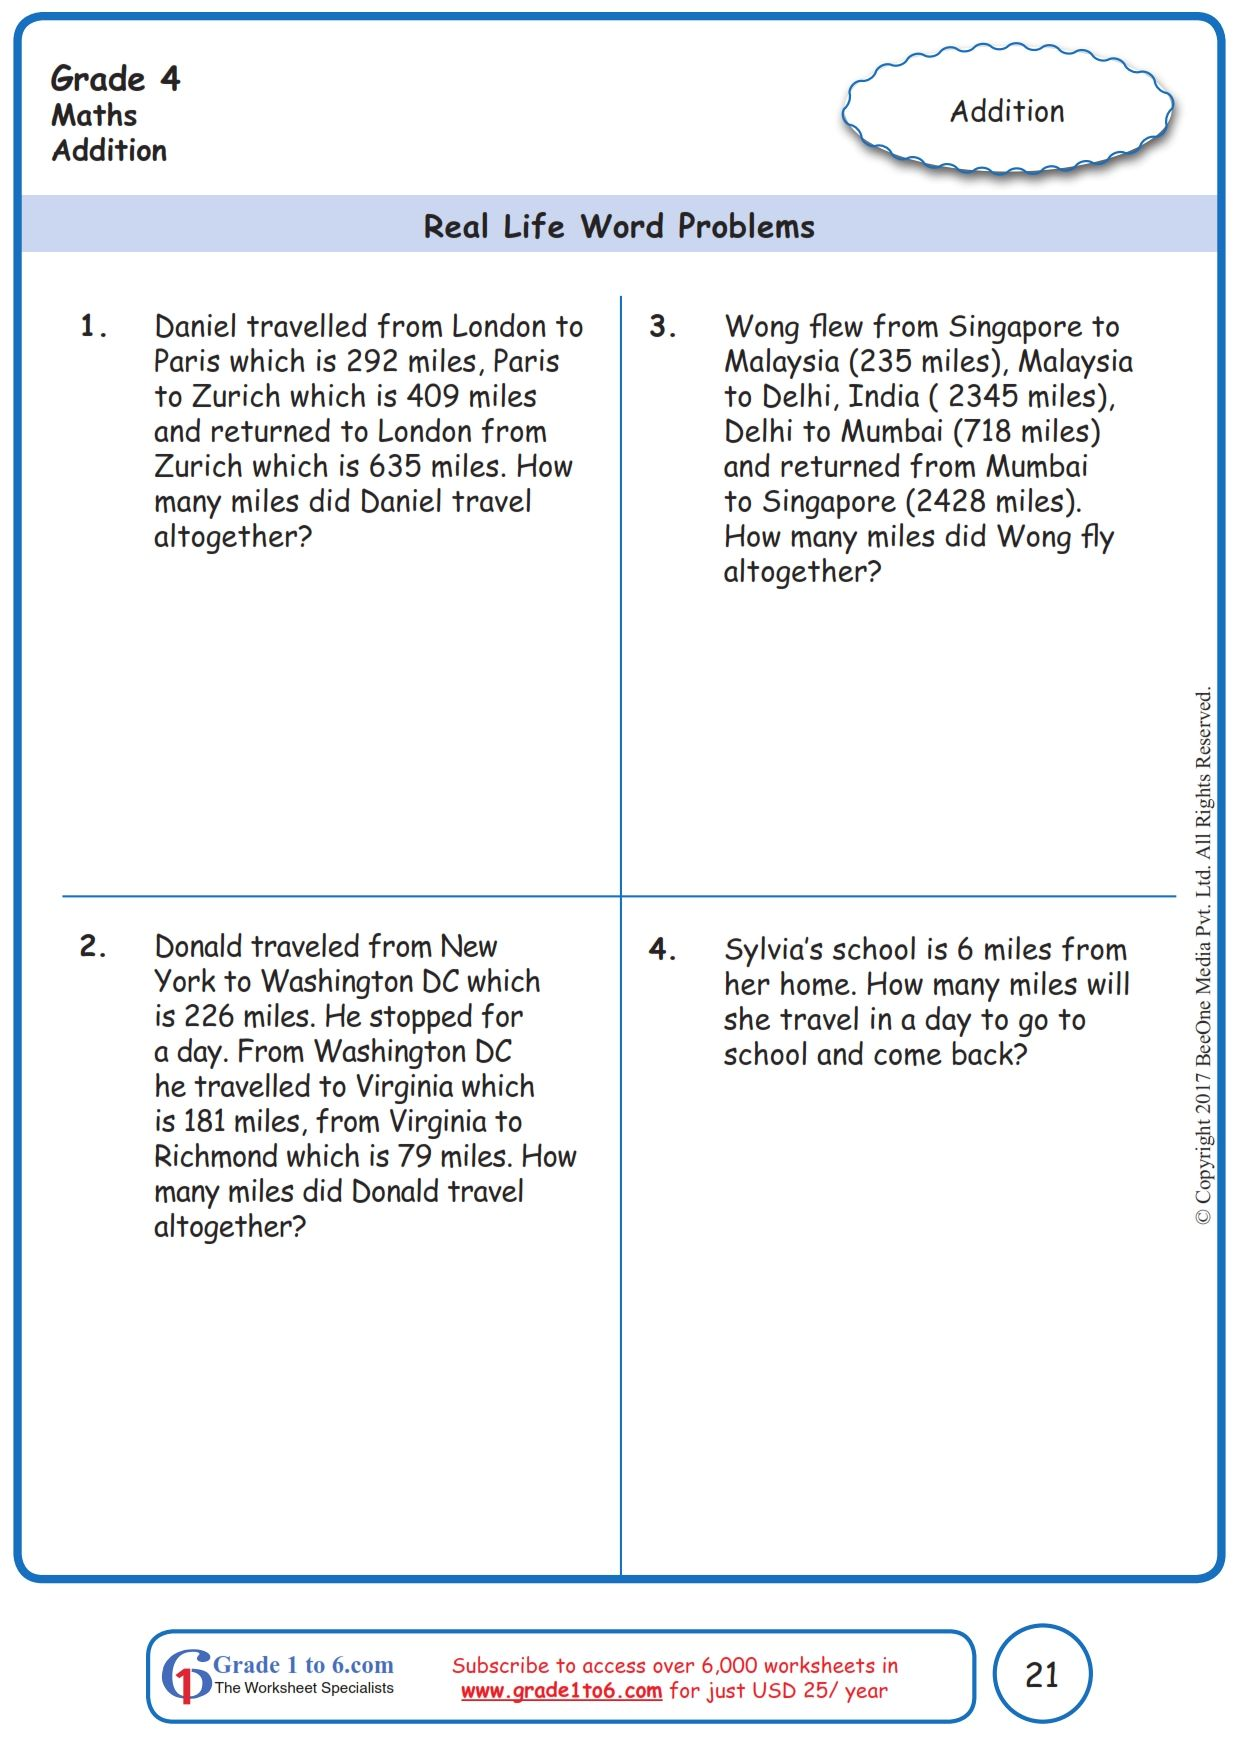 Pin on Grade 4 Math Worksheets: PYP/CBSE/ICSE/Common Core [ 1754 x 1239 Pixel ]